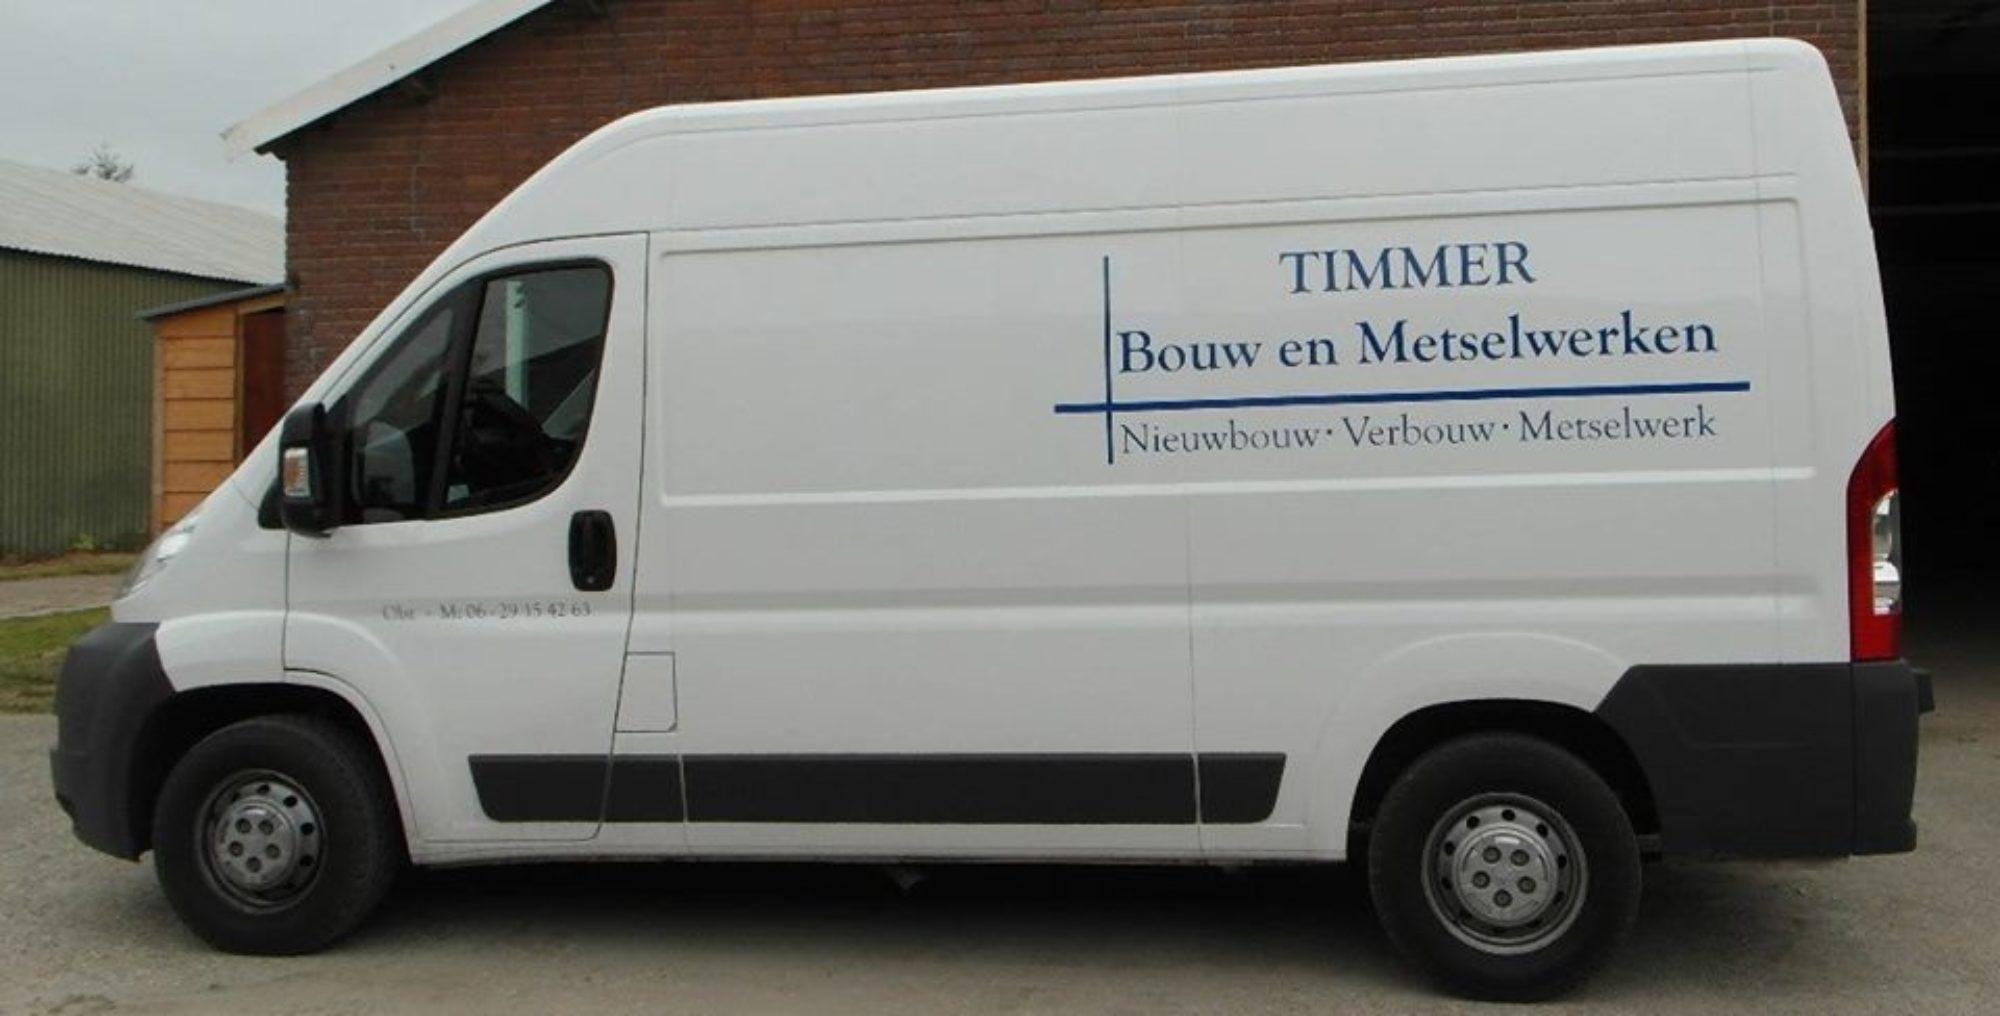 Timmer Bouw en Metselwerken